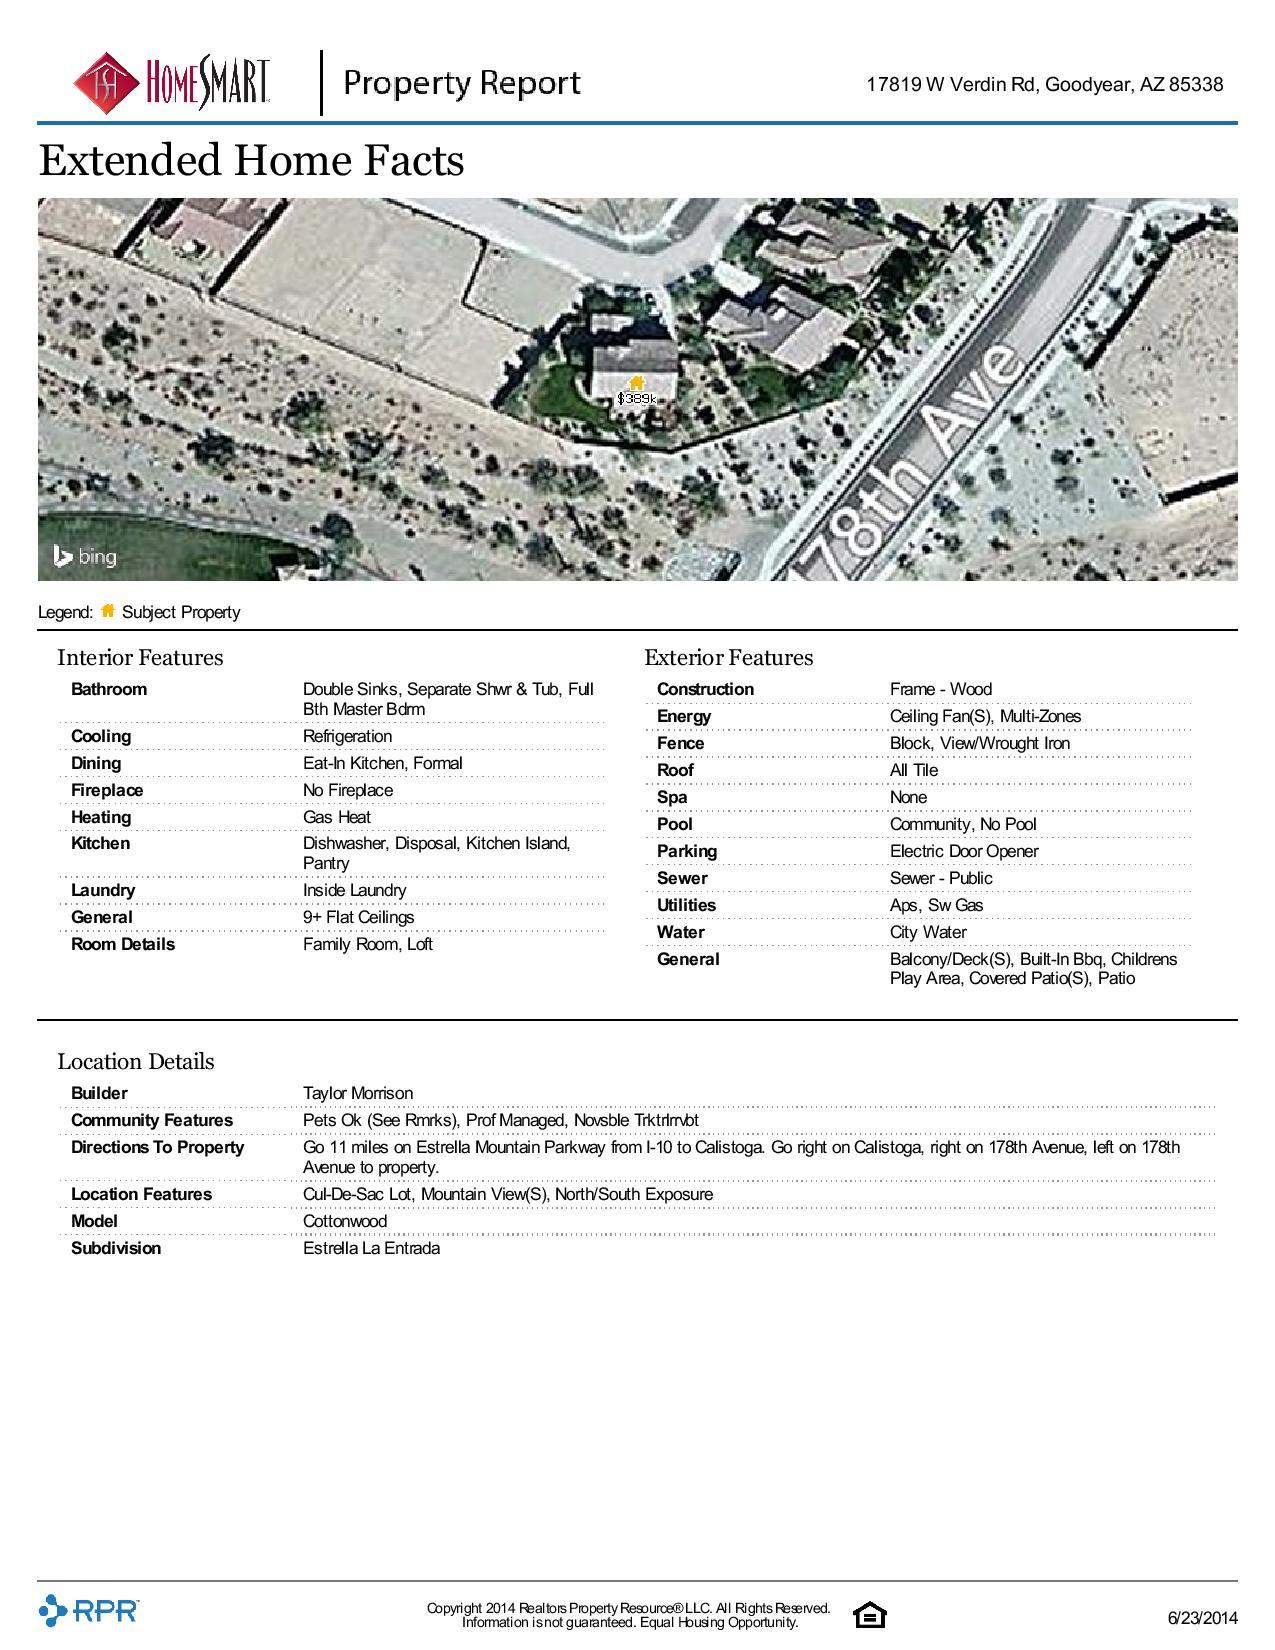 17819-W-Verdin-Rd-Goodyear-AZ-85338-page-004